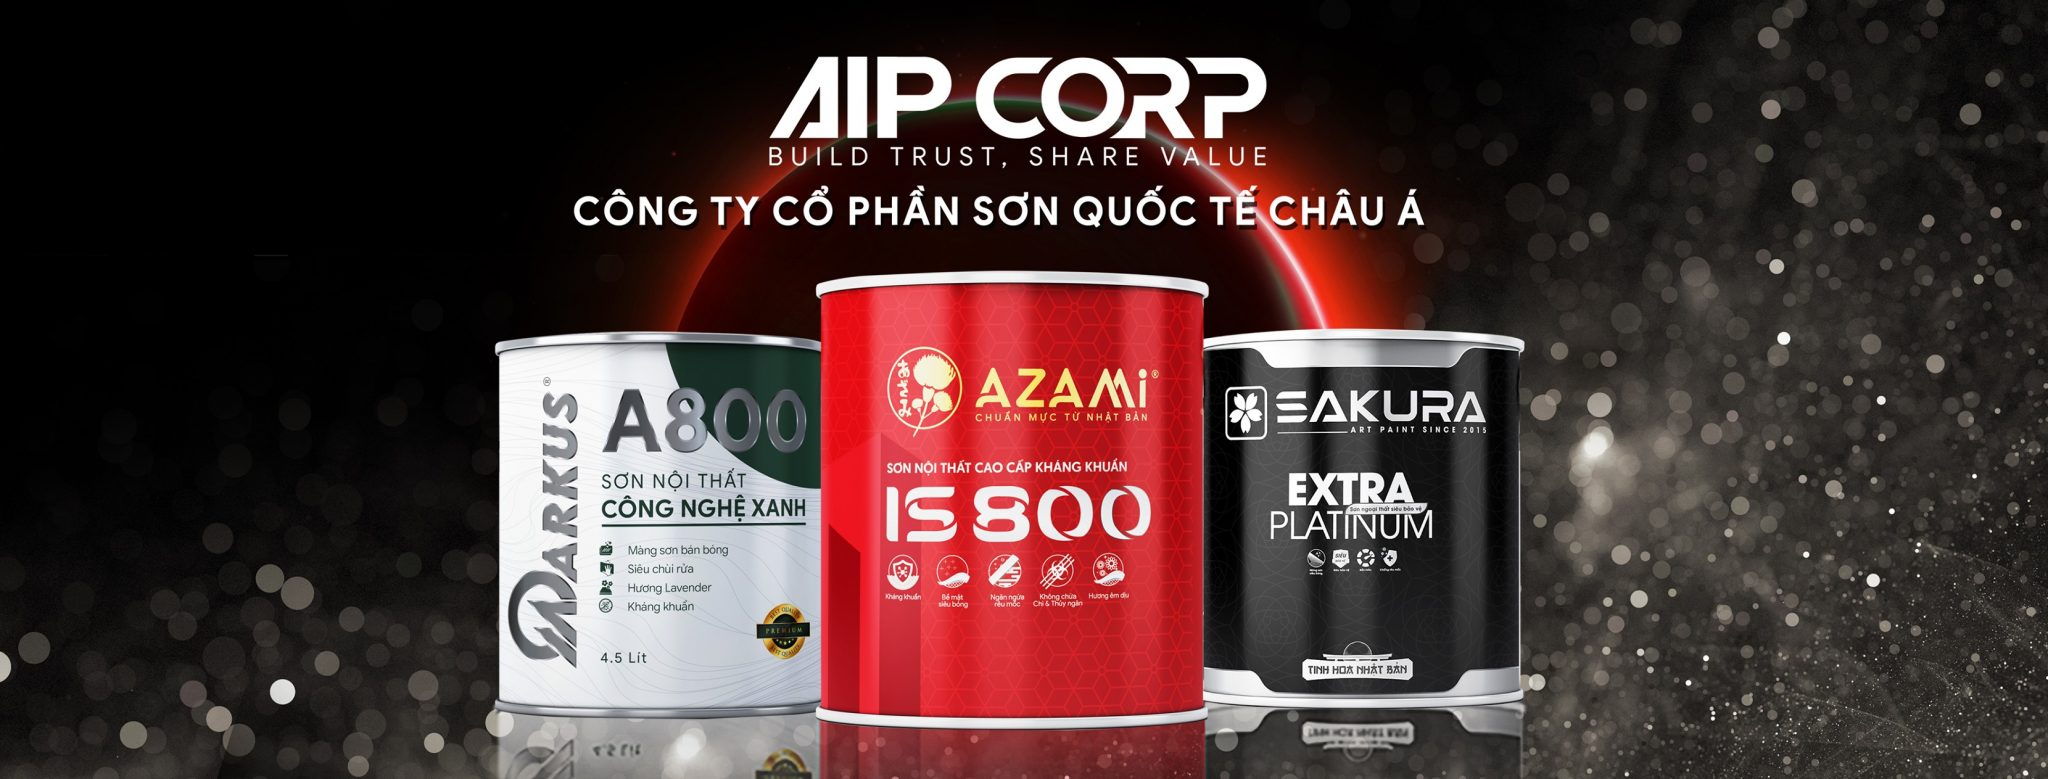 AIP Corp